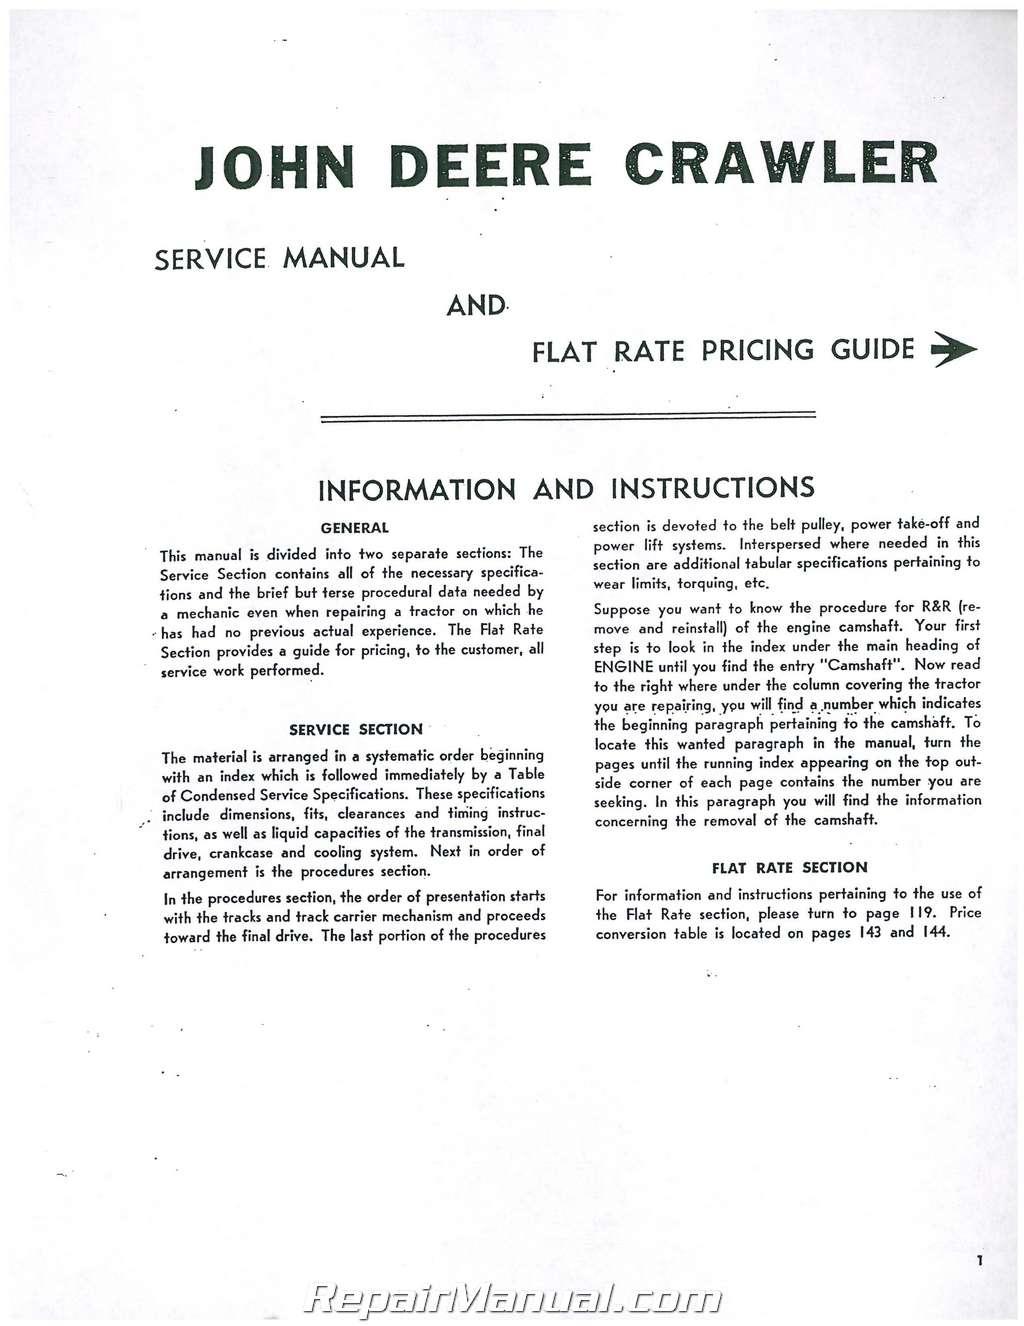 john deere mc 40c 420c 430c 4401c 4401cd crawler service manual rh repairmanual com John Deere 420 John Deere 420